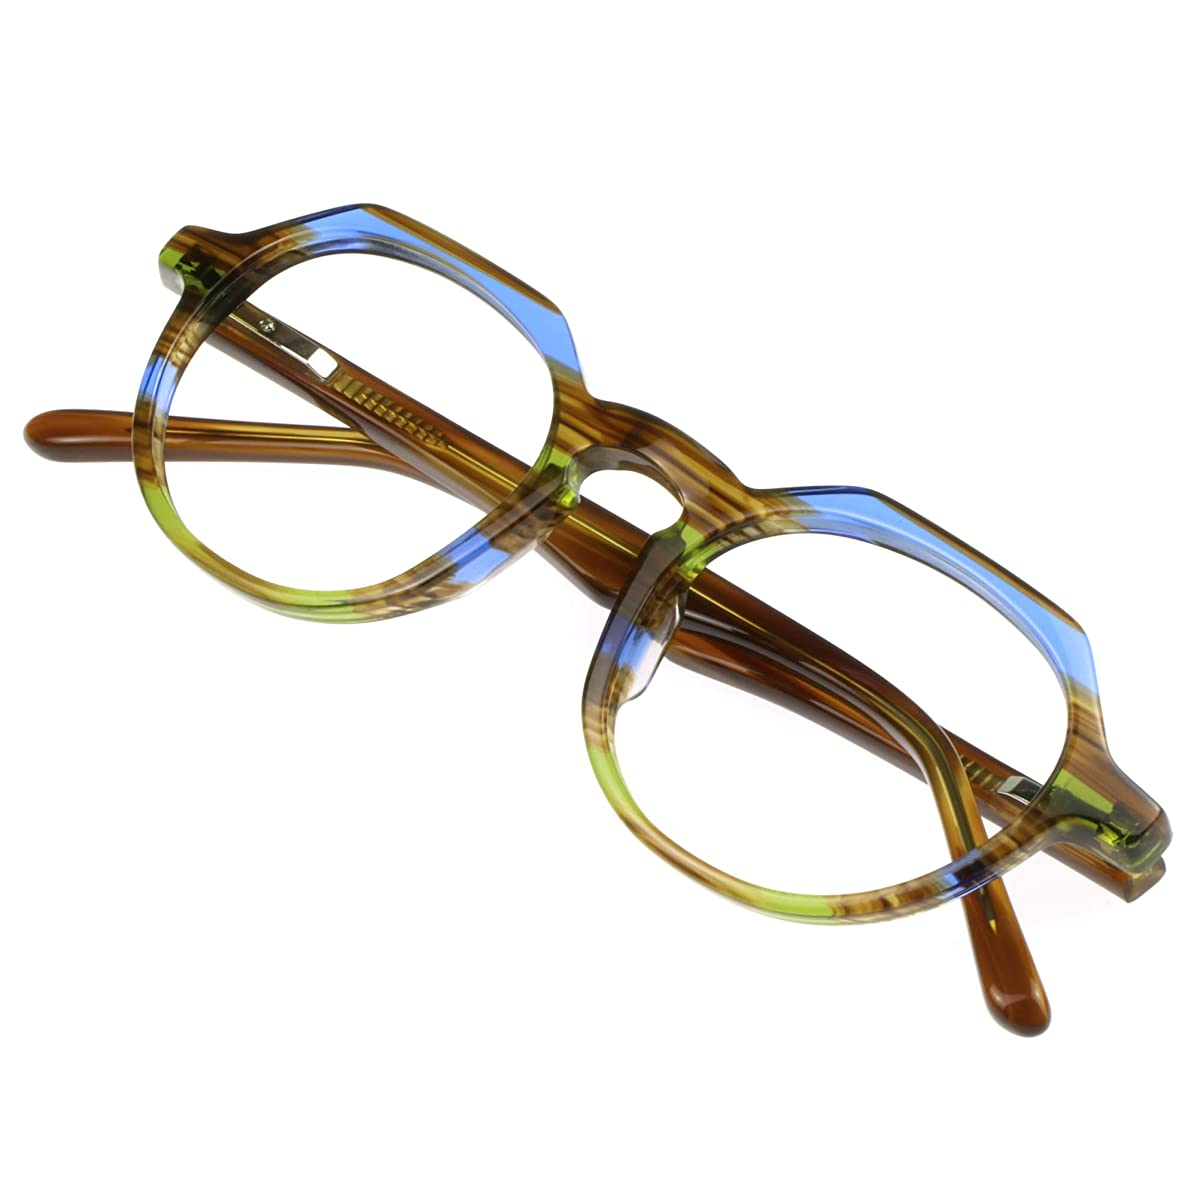 Blue Light Blocking Computer Glasses, Reading/Gaming/Glasses for Adults, Anti Eyestrain Filter UV Glare & Reduce Headache (+2.25 Magnification)